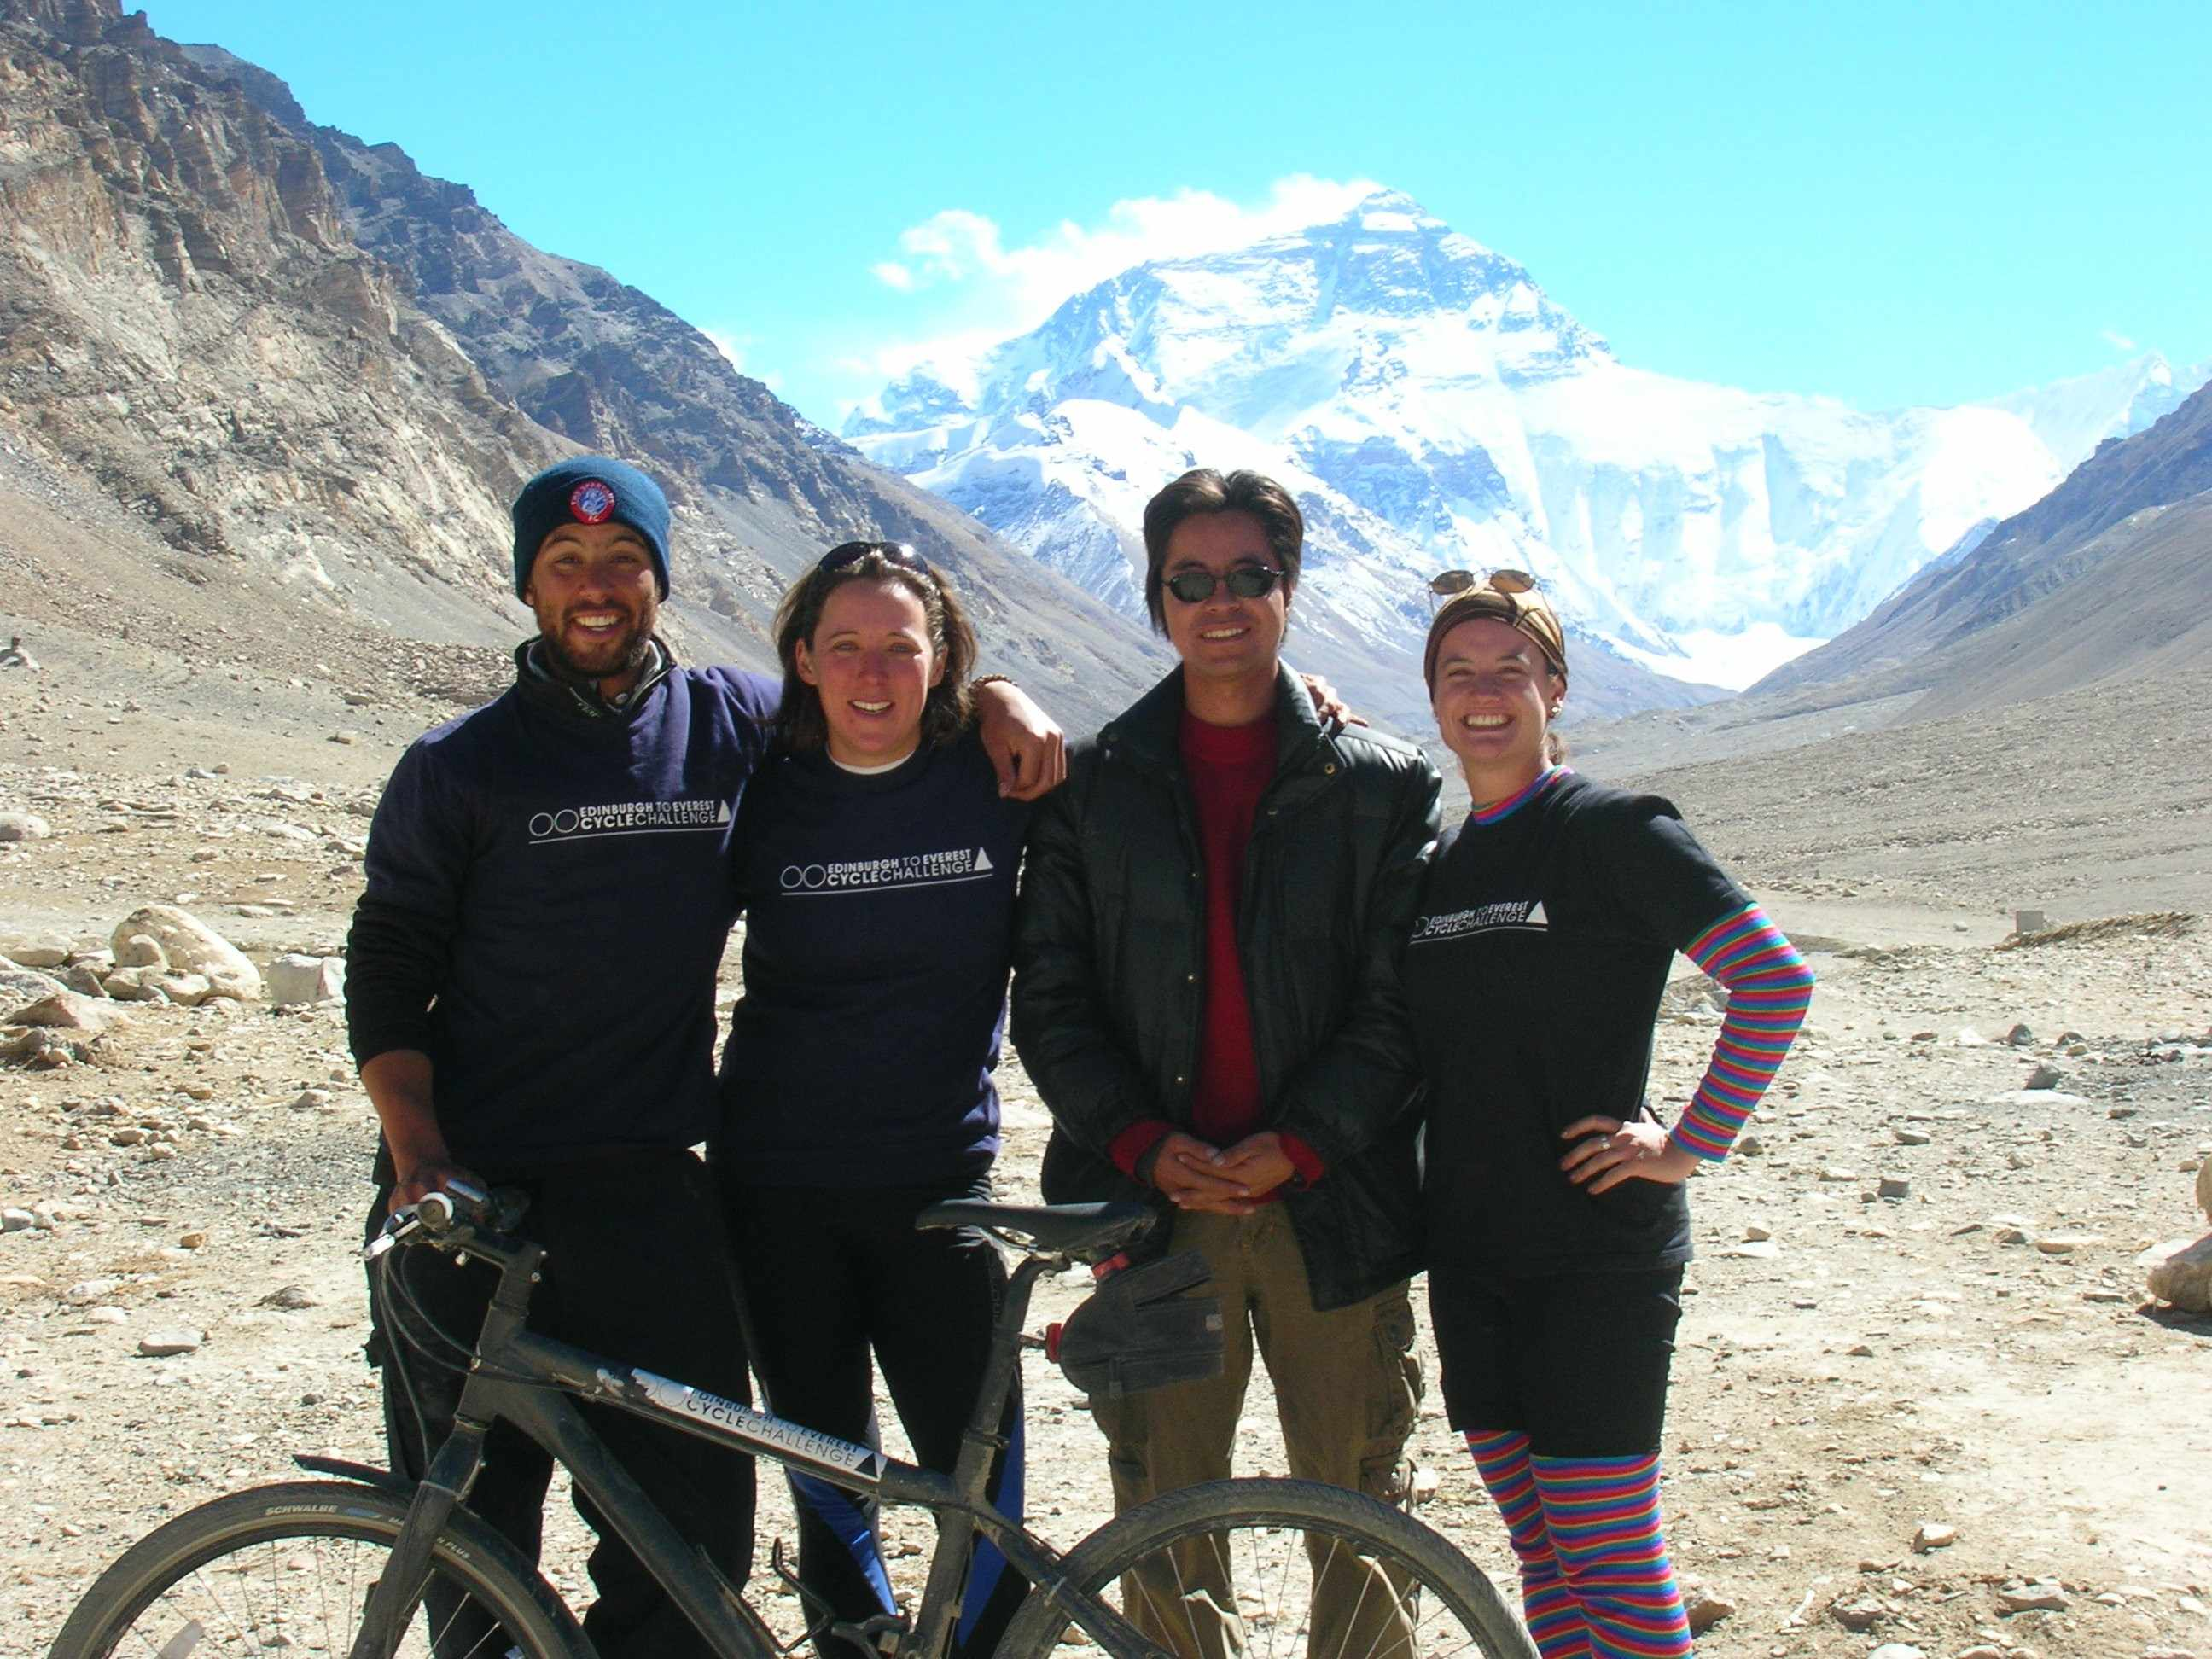 The Edinburgh to Everest team reach their goal